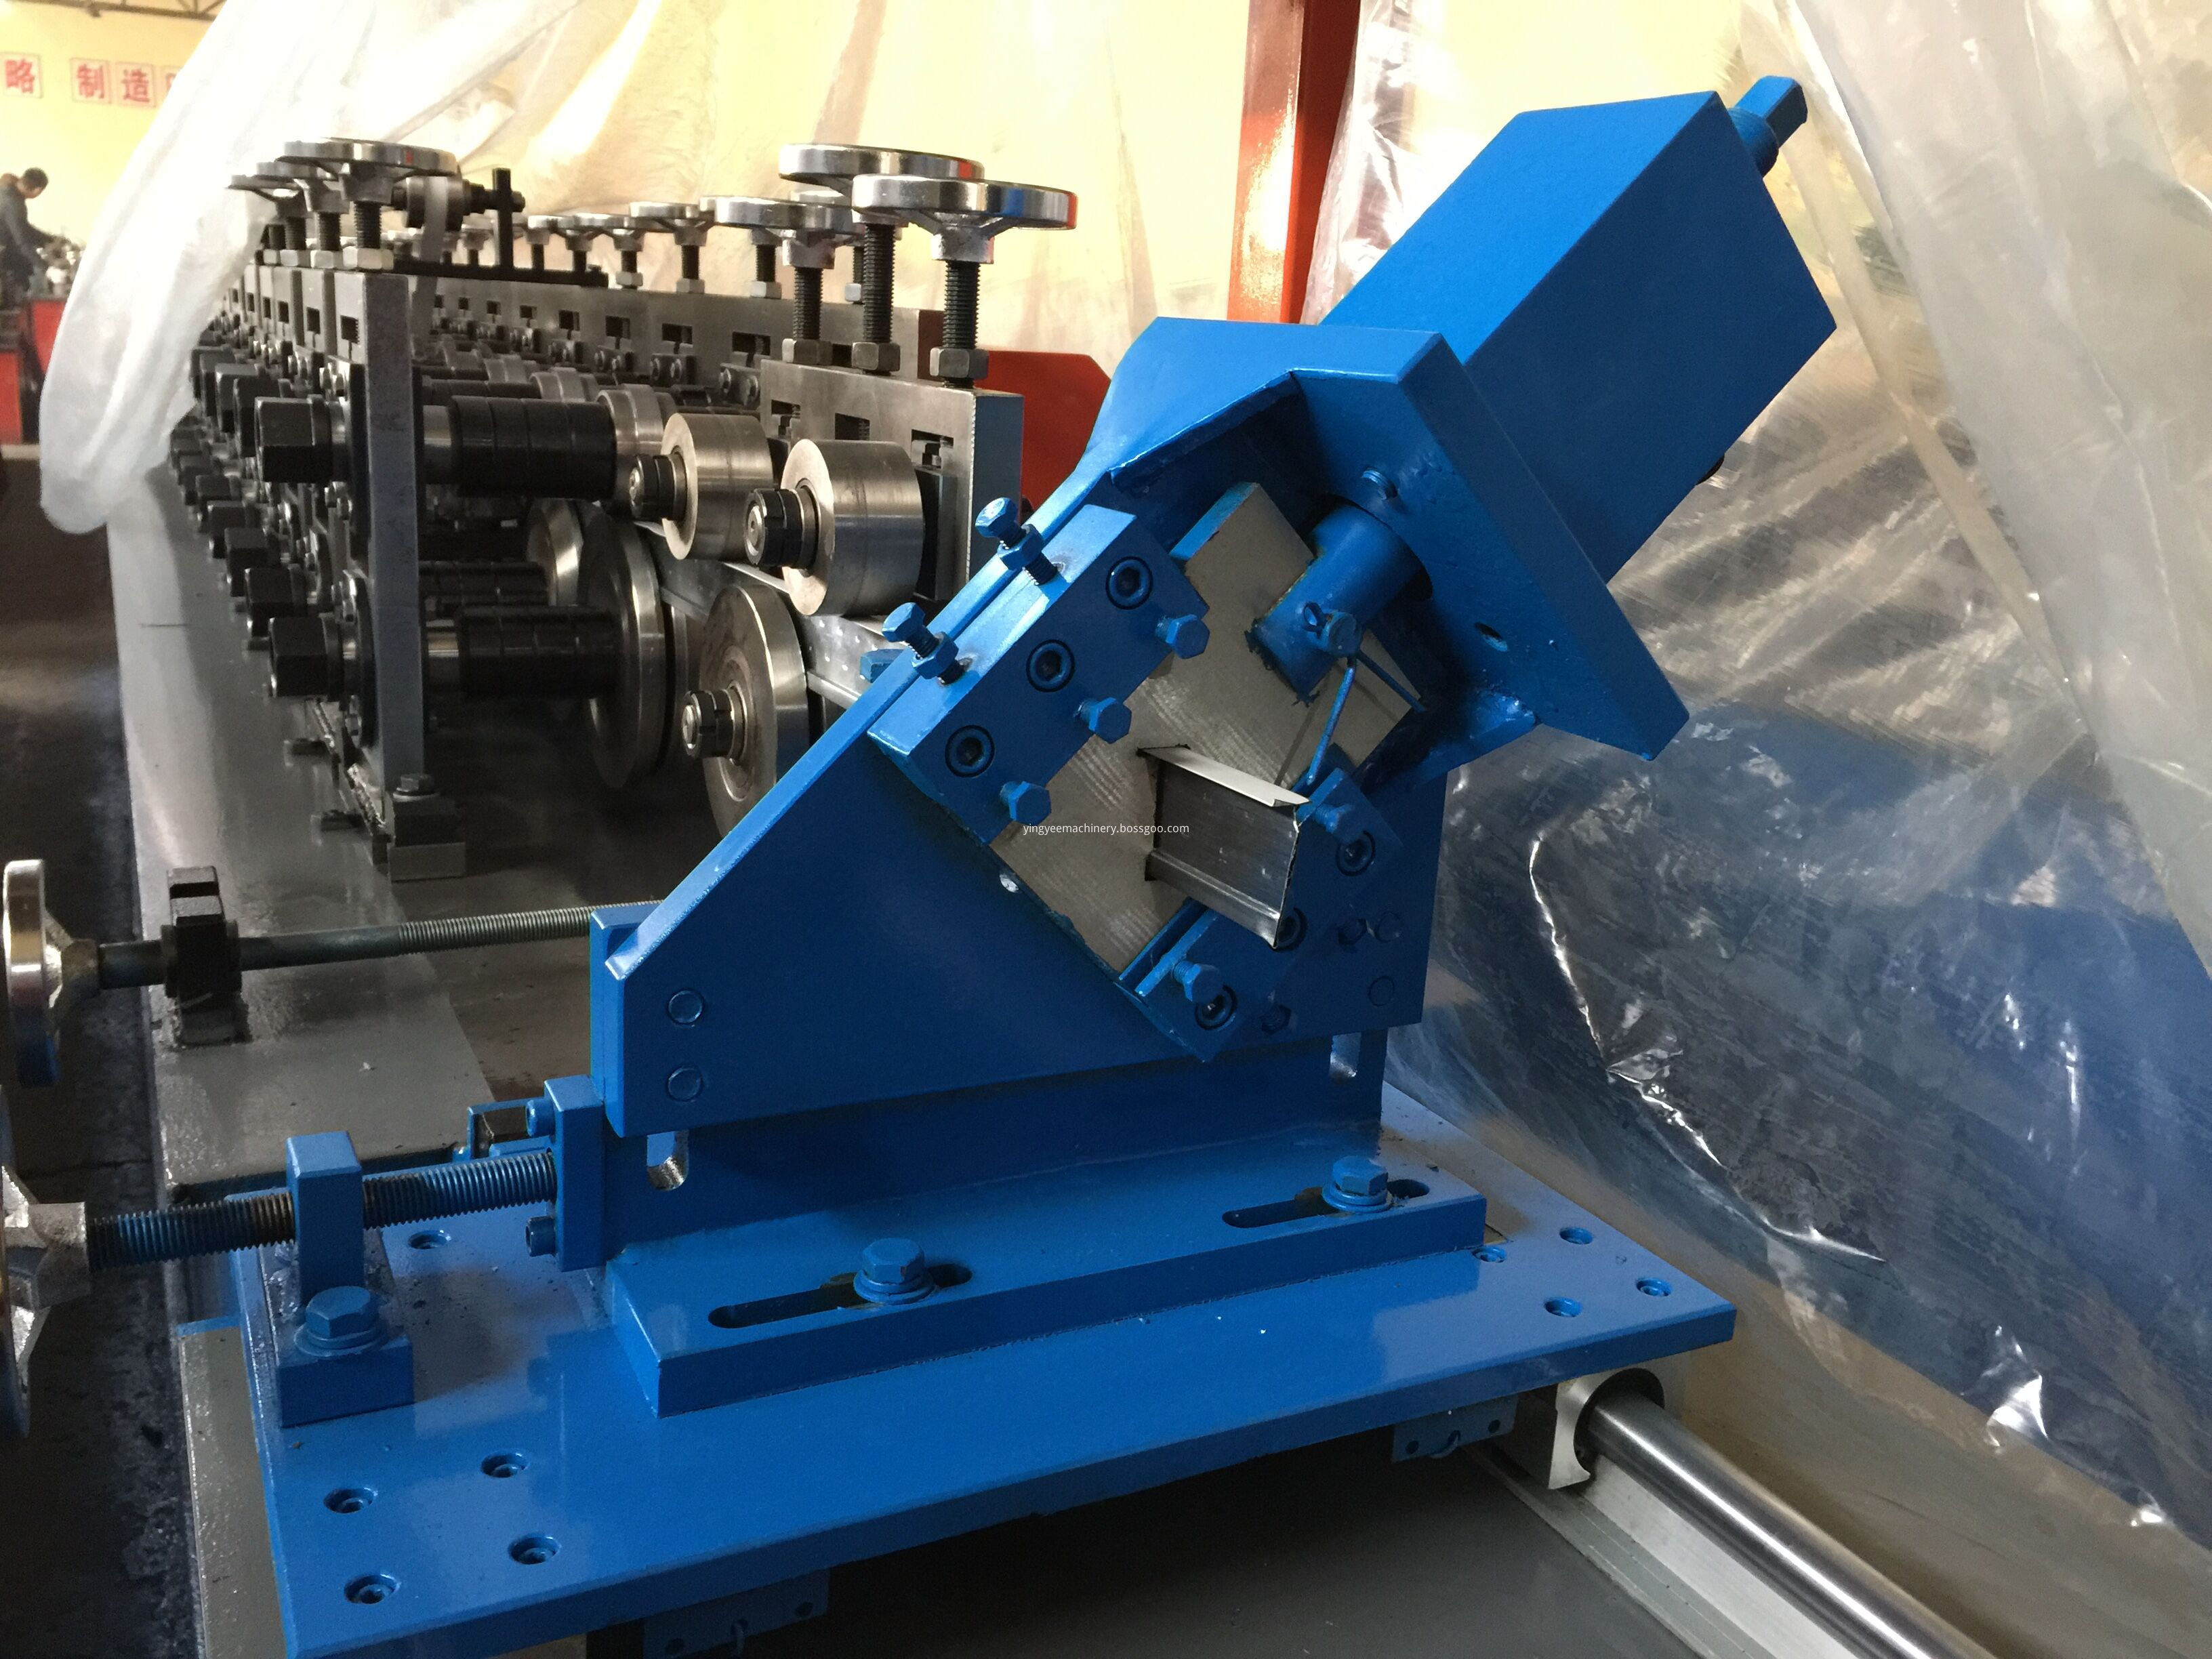 Ceiling keel roll forming machine